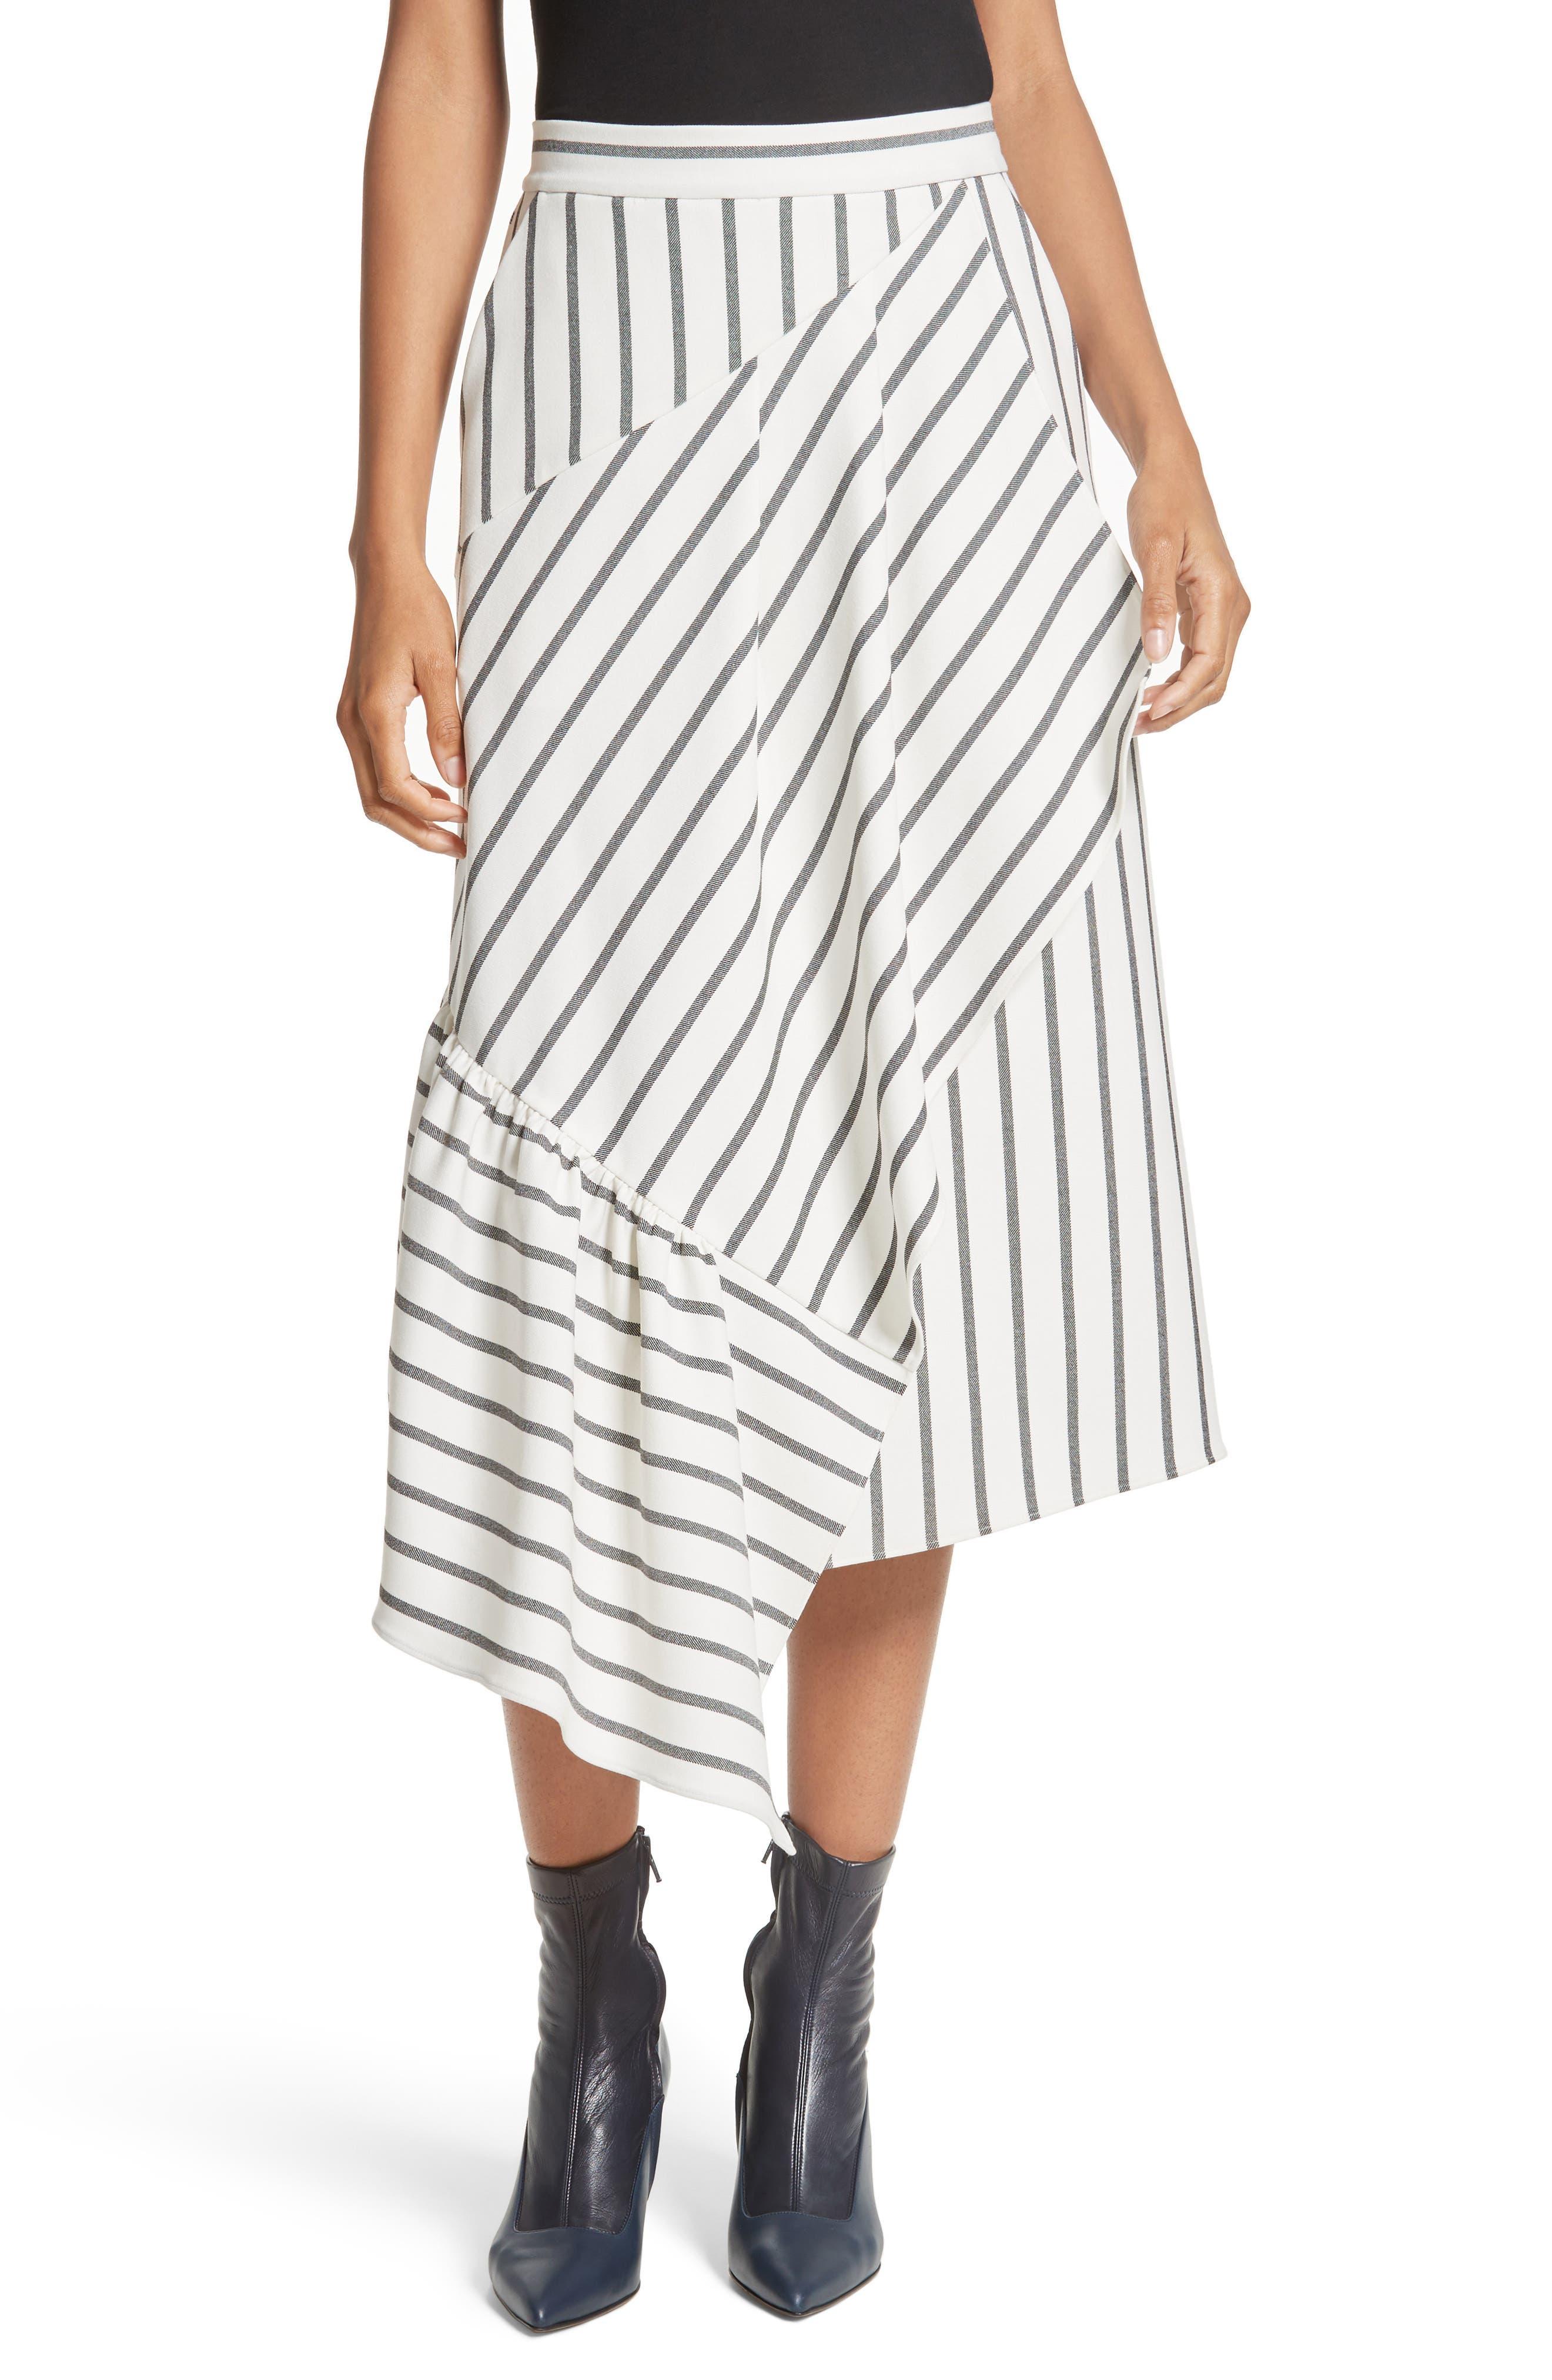 Tibi Lucci Stripe Midi Skirt